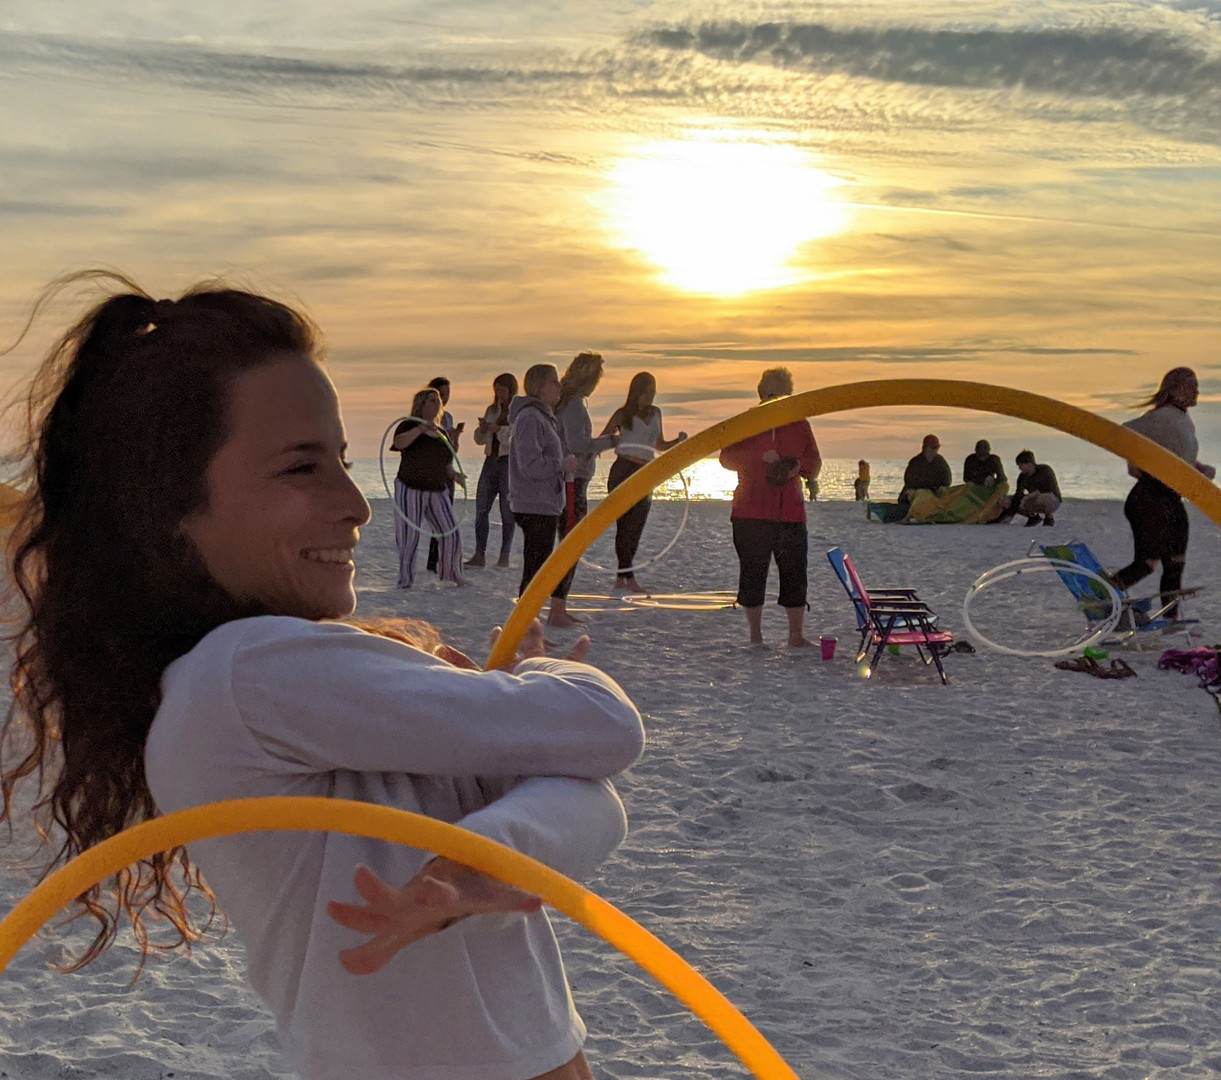 sunset-hula-hoop-meetup.jpg